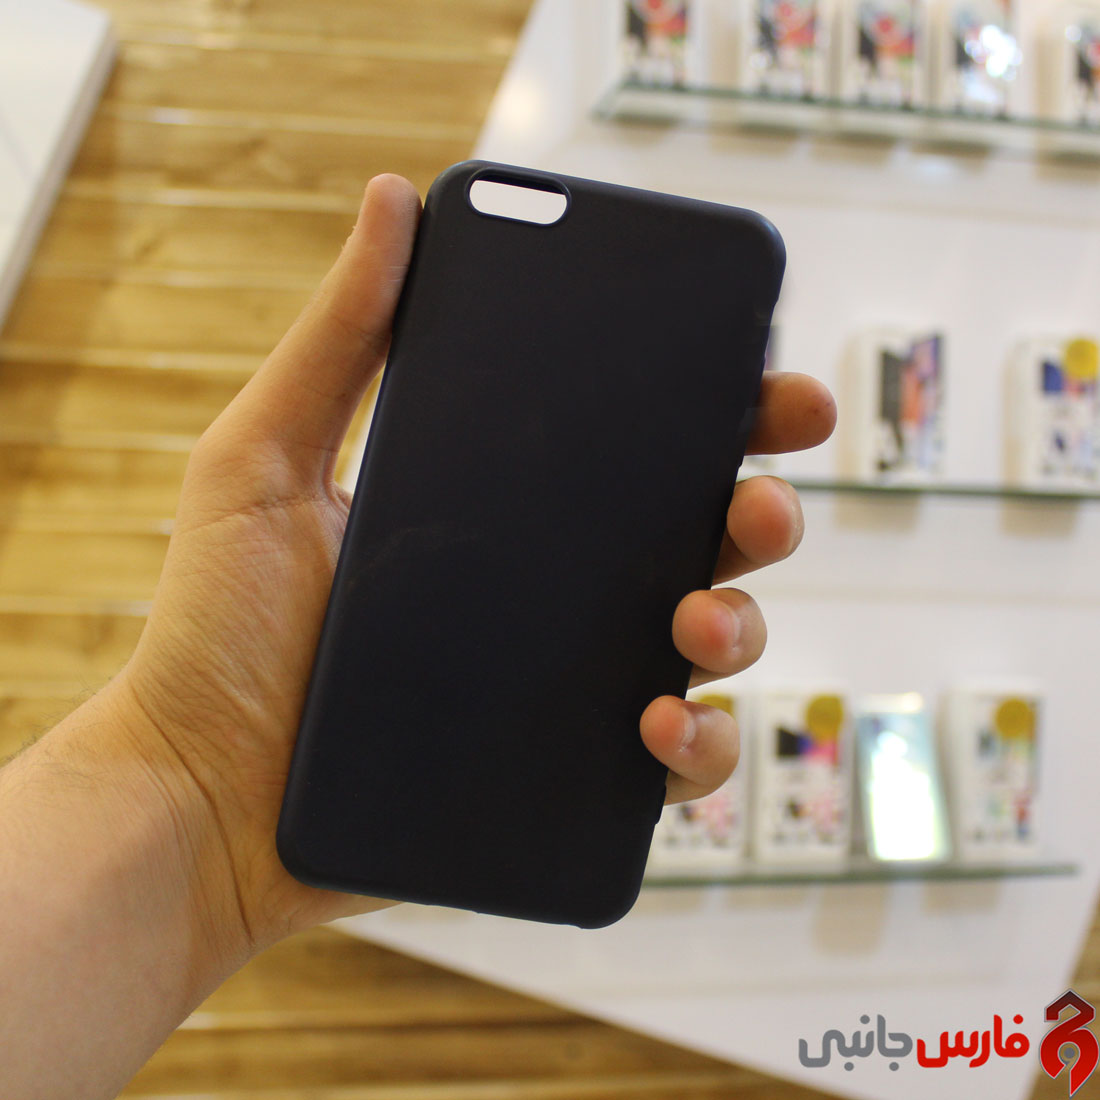 iphone-6+-blue